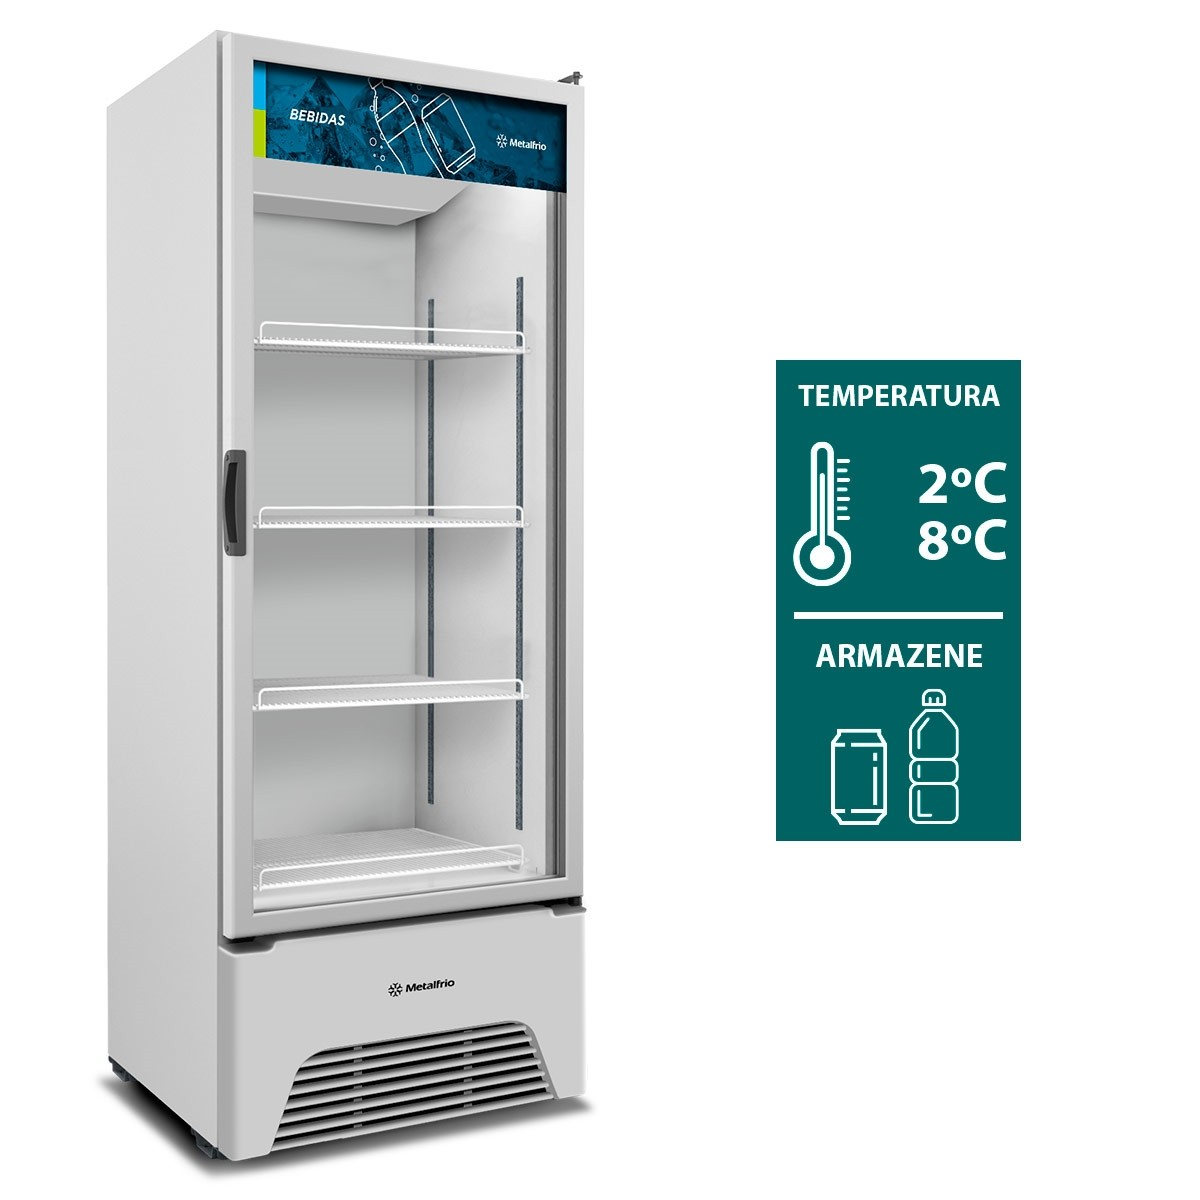 Refrigerador Expositor 497 Litros VB52AH Optima Metalfrio